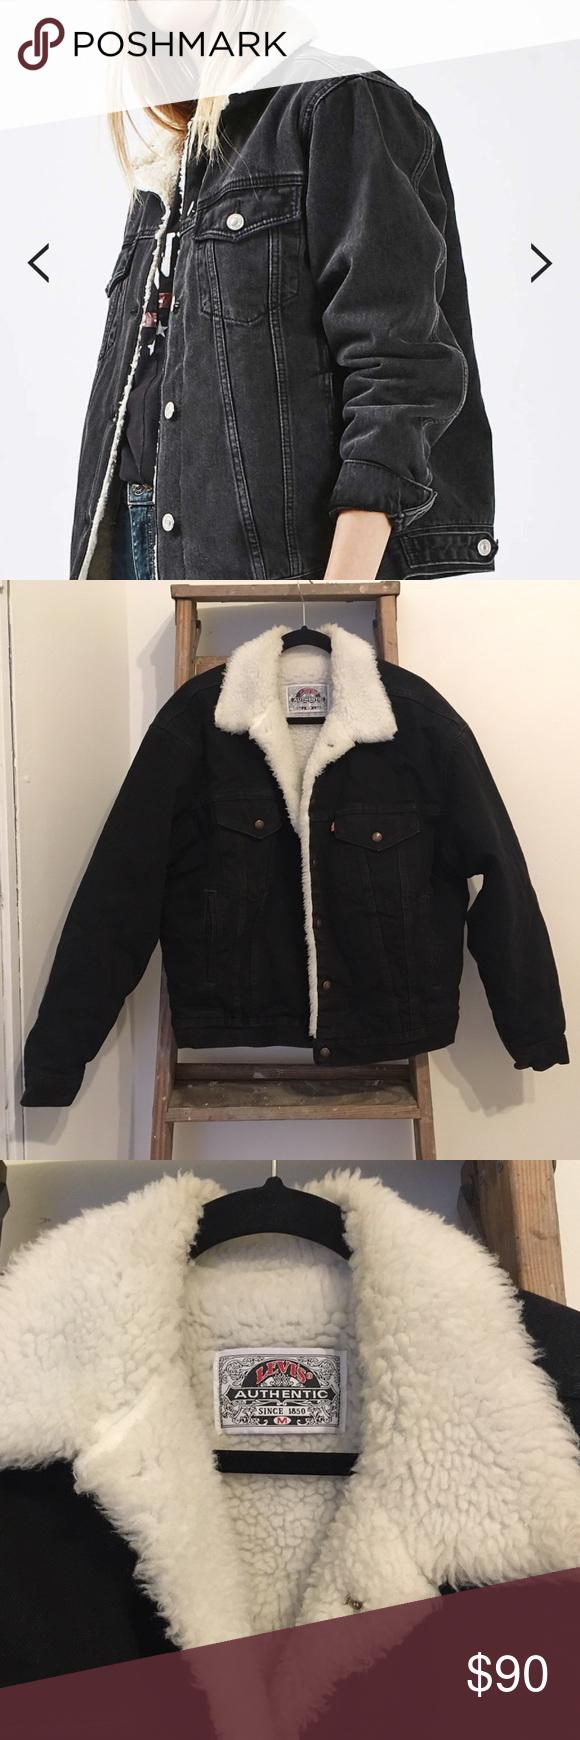 fcbede925d61 Levi's Black Sherpa Denim Jacket Levi's black denim Sherpa jacket. Shearling  lining. Men's size M, fits women's size L or women's M oversized.